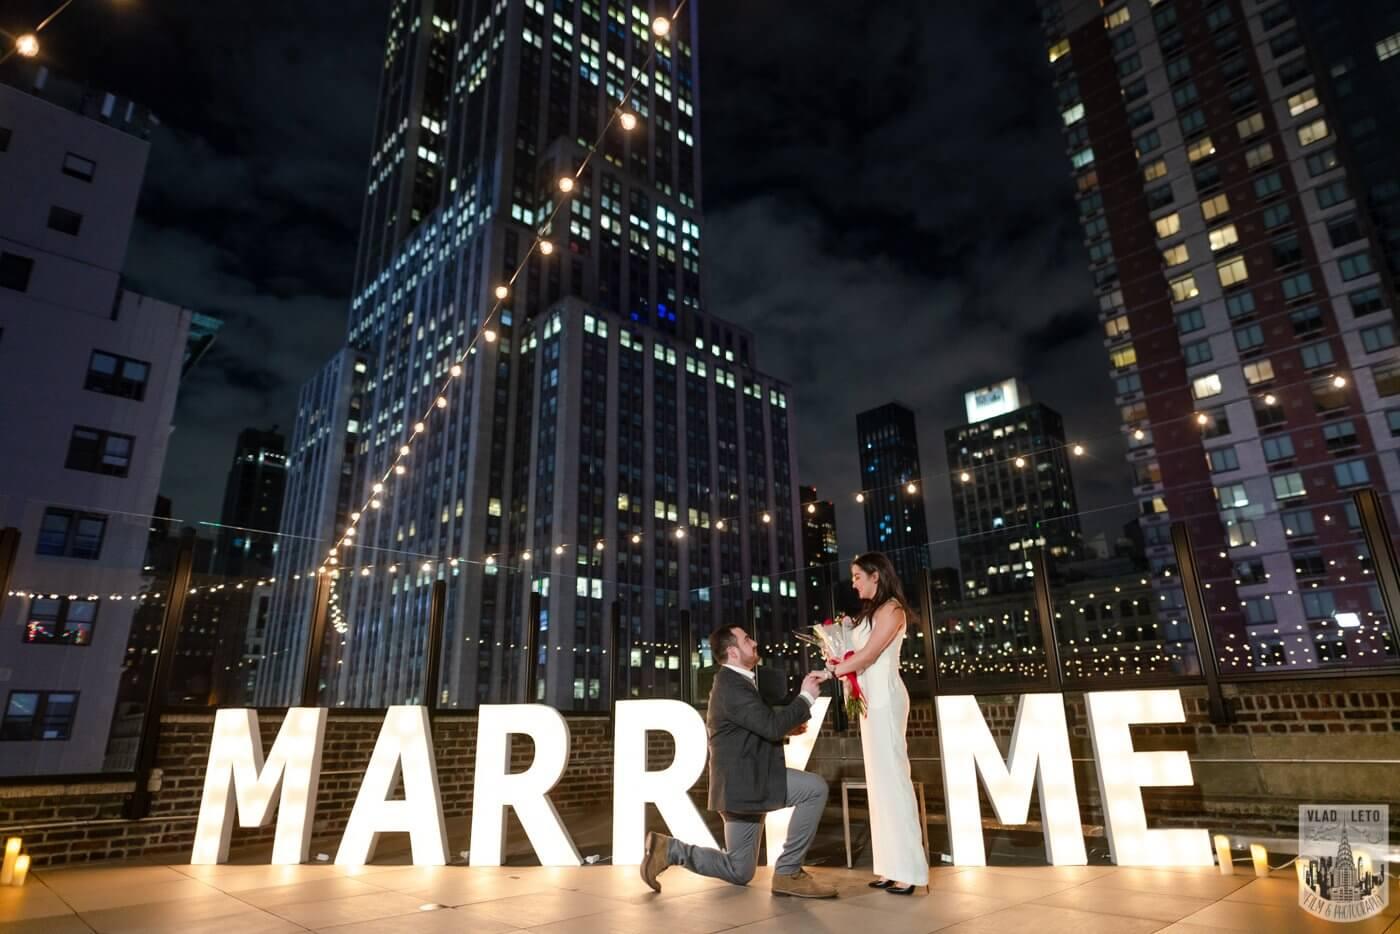 Photo 3 Gigantic Marry Me Letters Rooftop Proposal | VladLeto